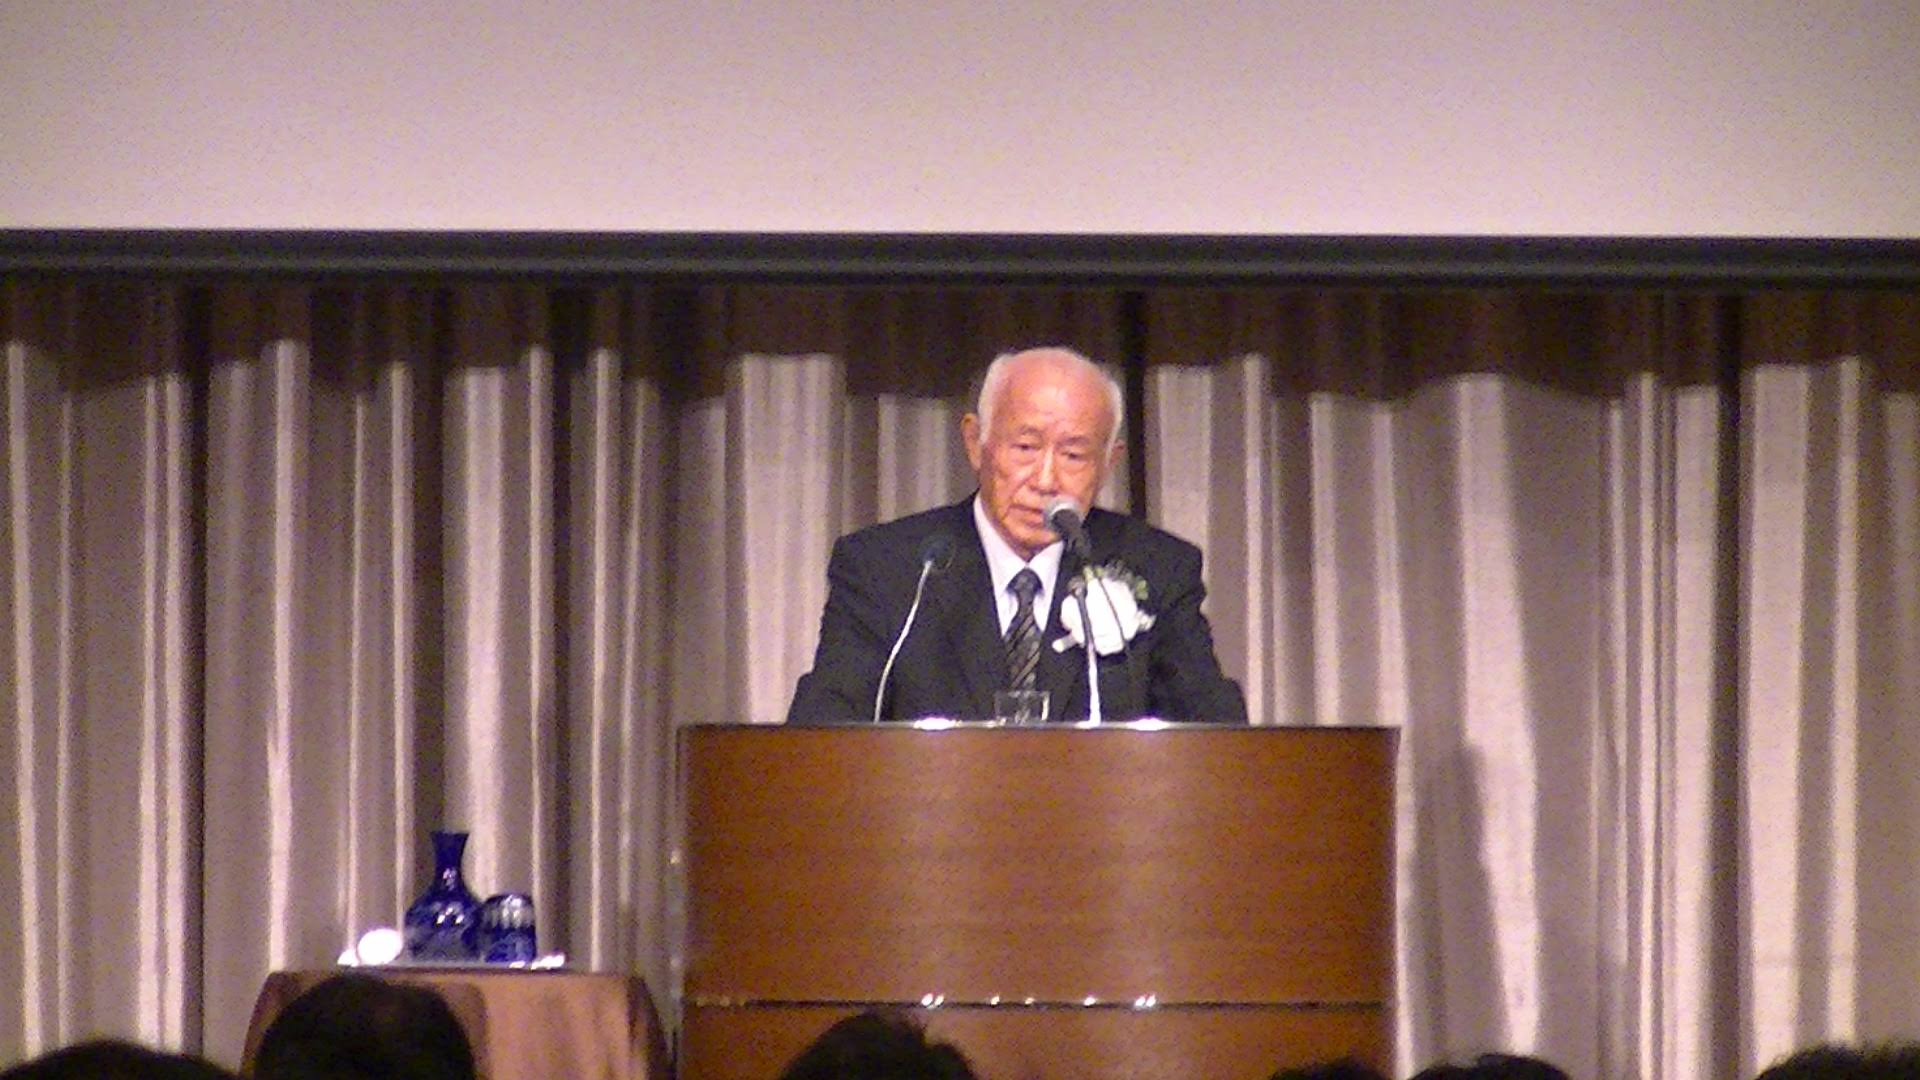 PIC 1669 1 - 思風会全国大会in広島